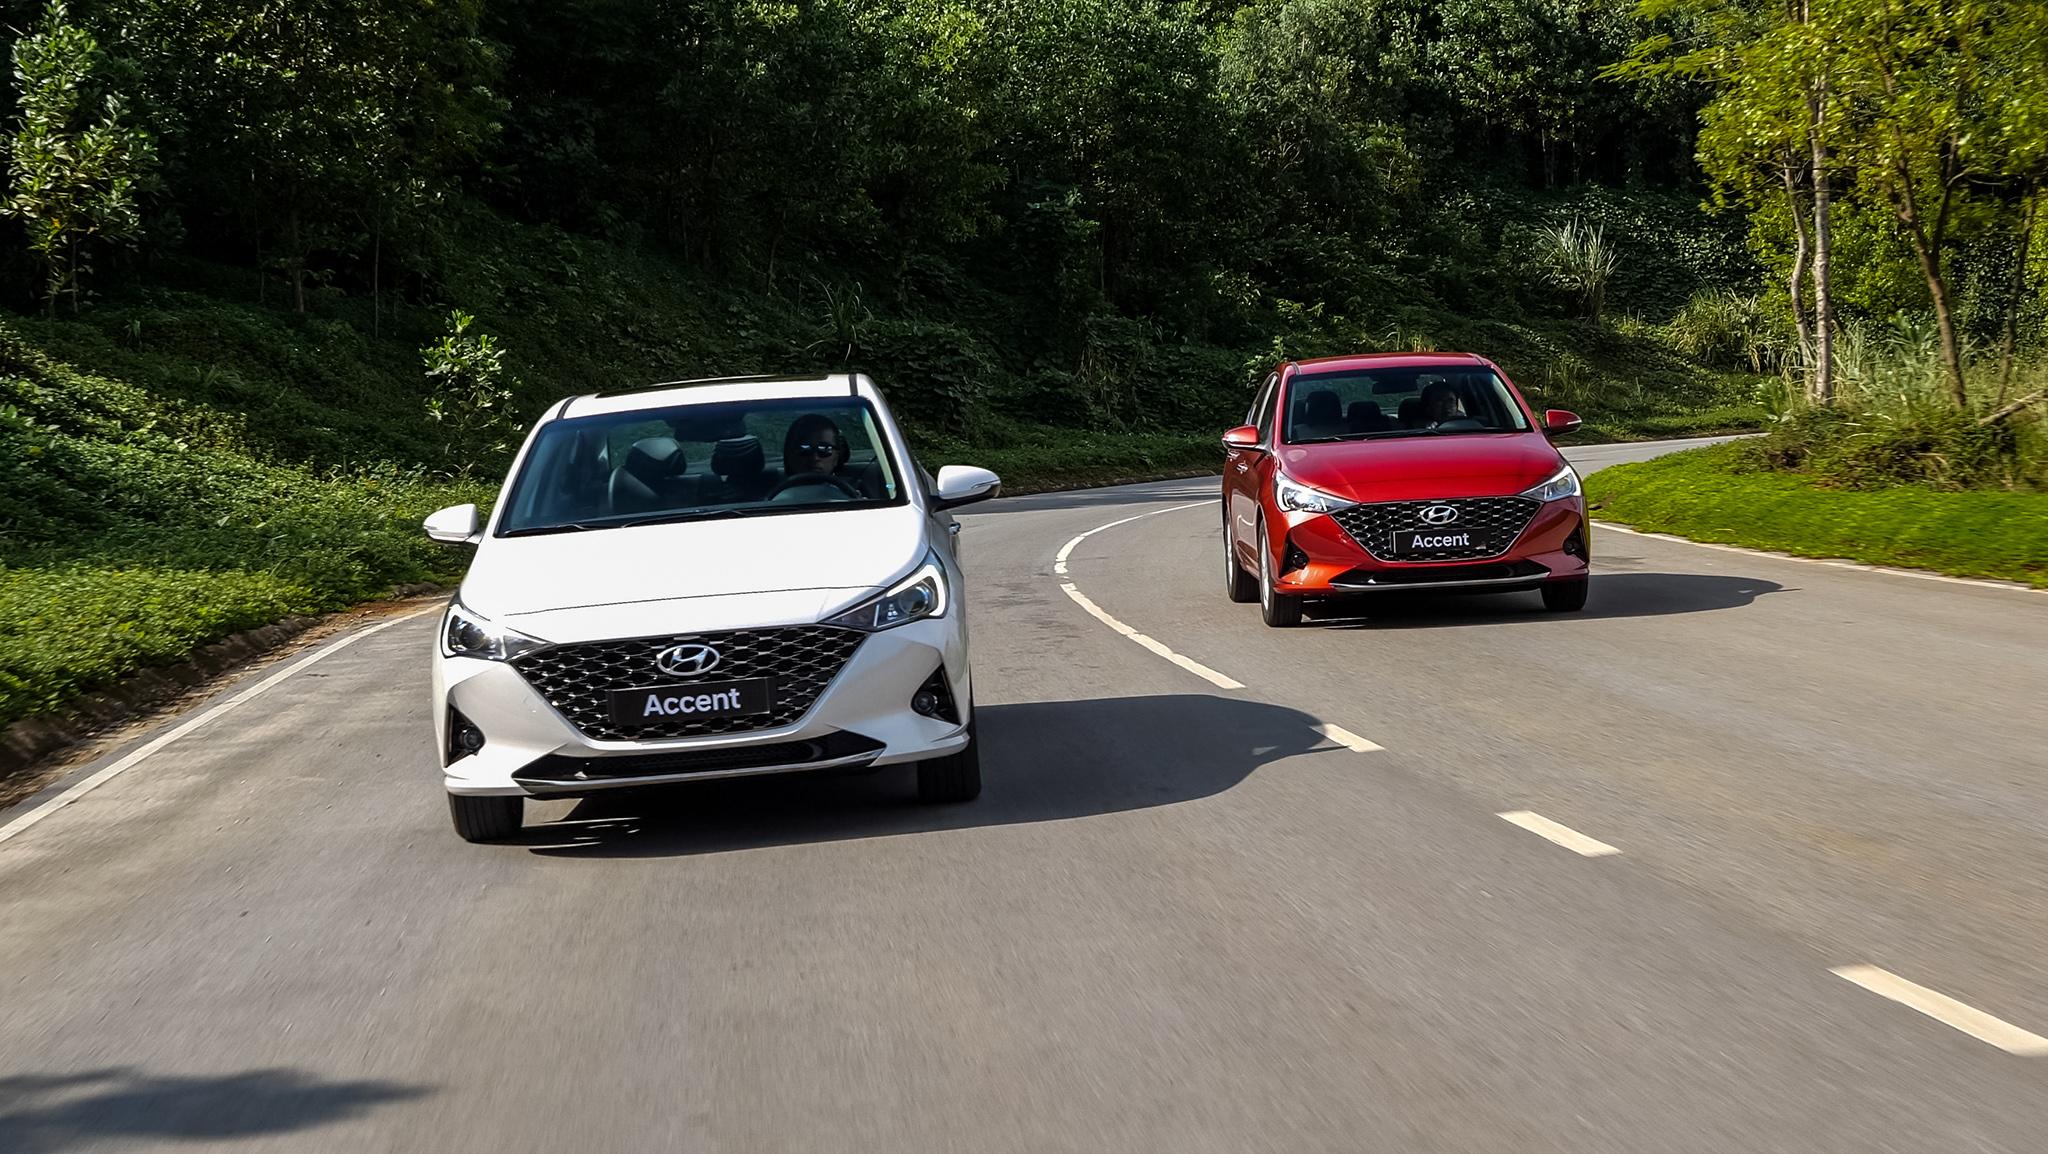 Hyundai Vinh giới thiệu Hyundai Accent 2021 giá từ 426,1 triệu đồng Hyundai-accent-2021-9